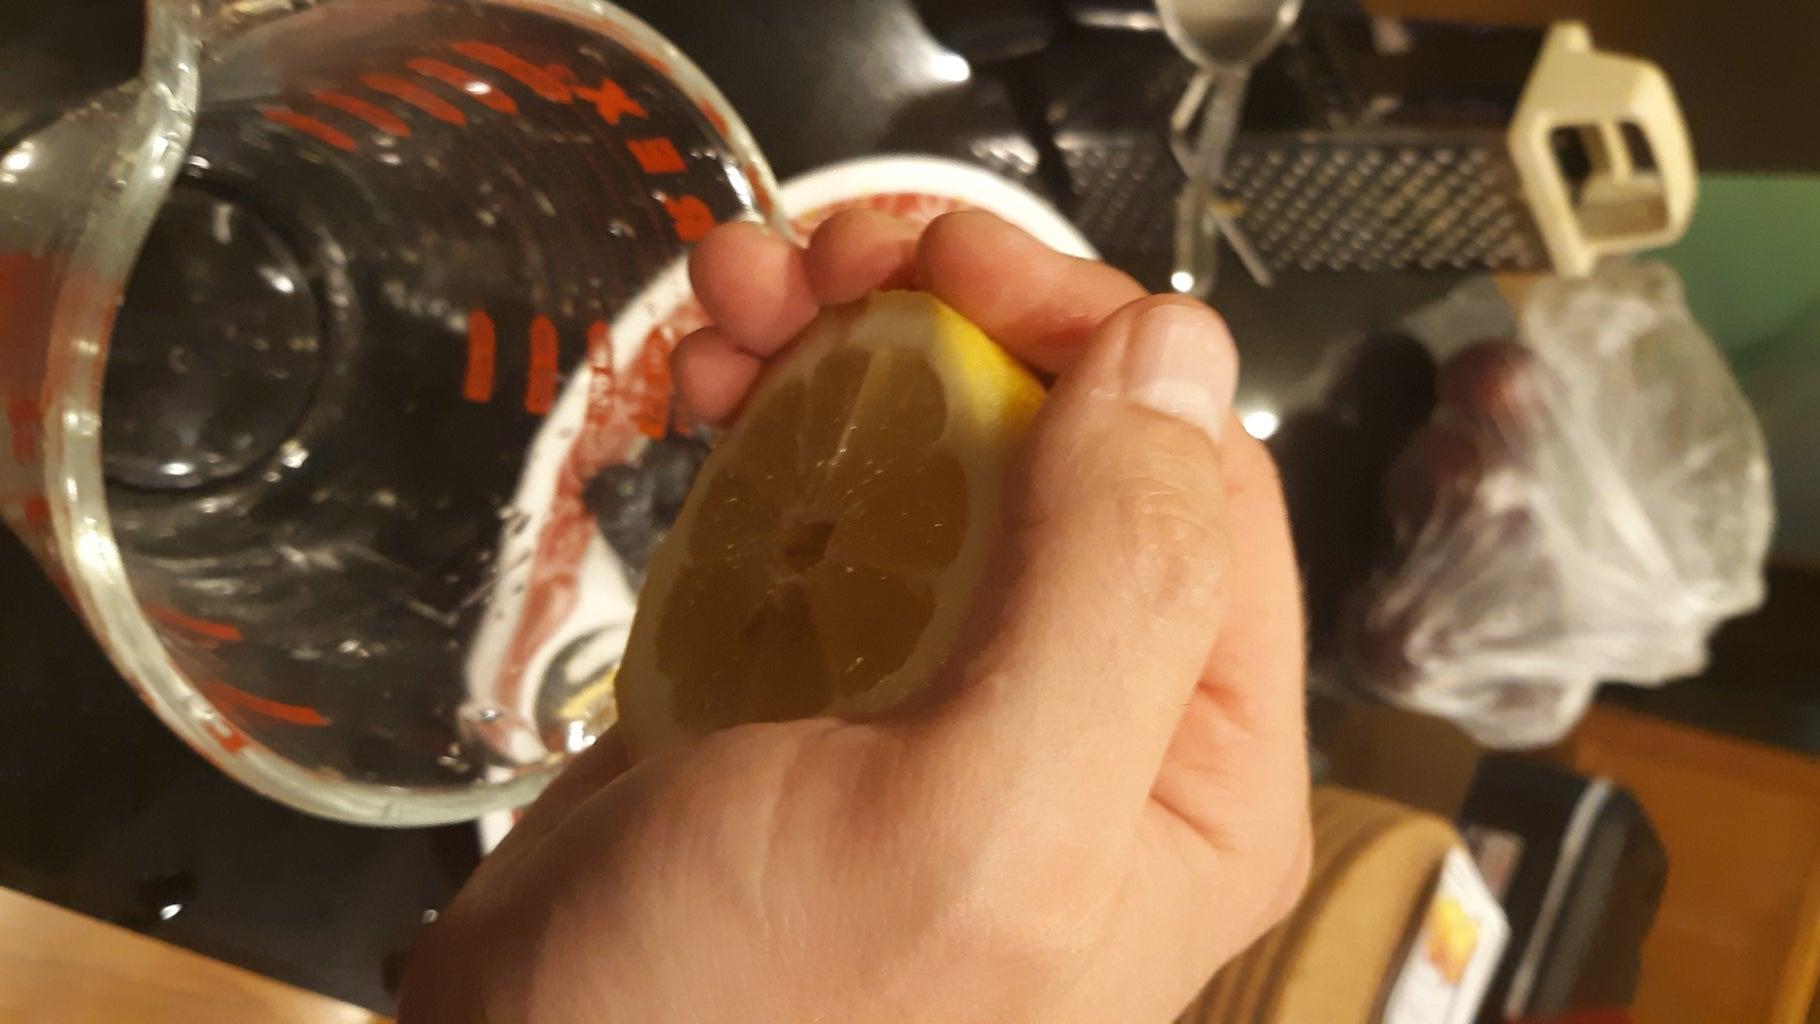 Back to the Lemons...